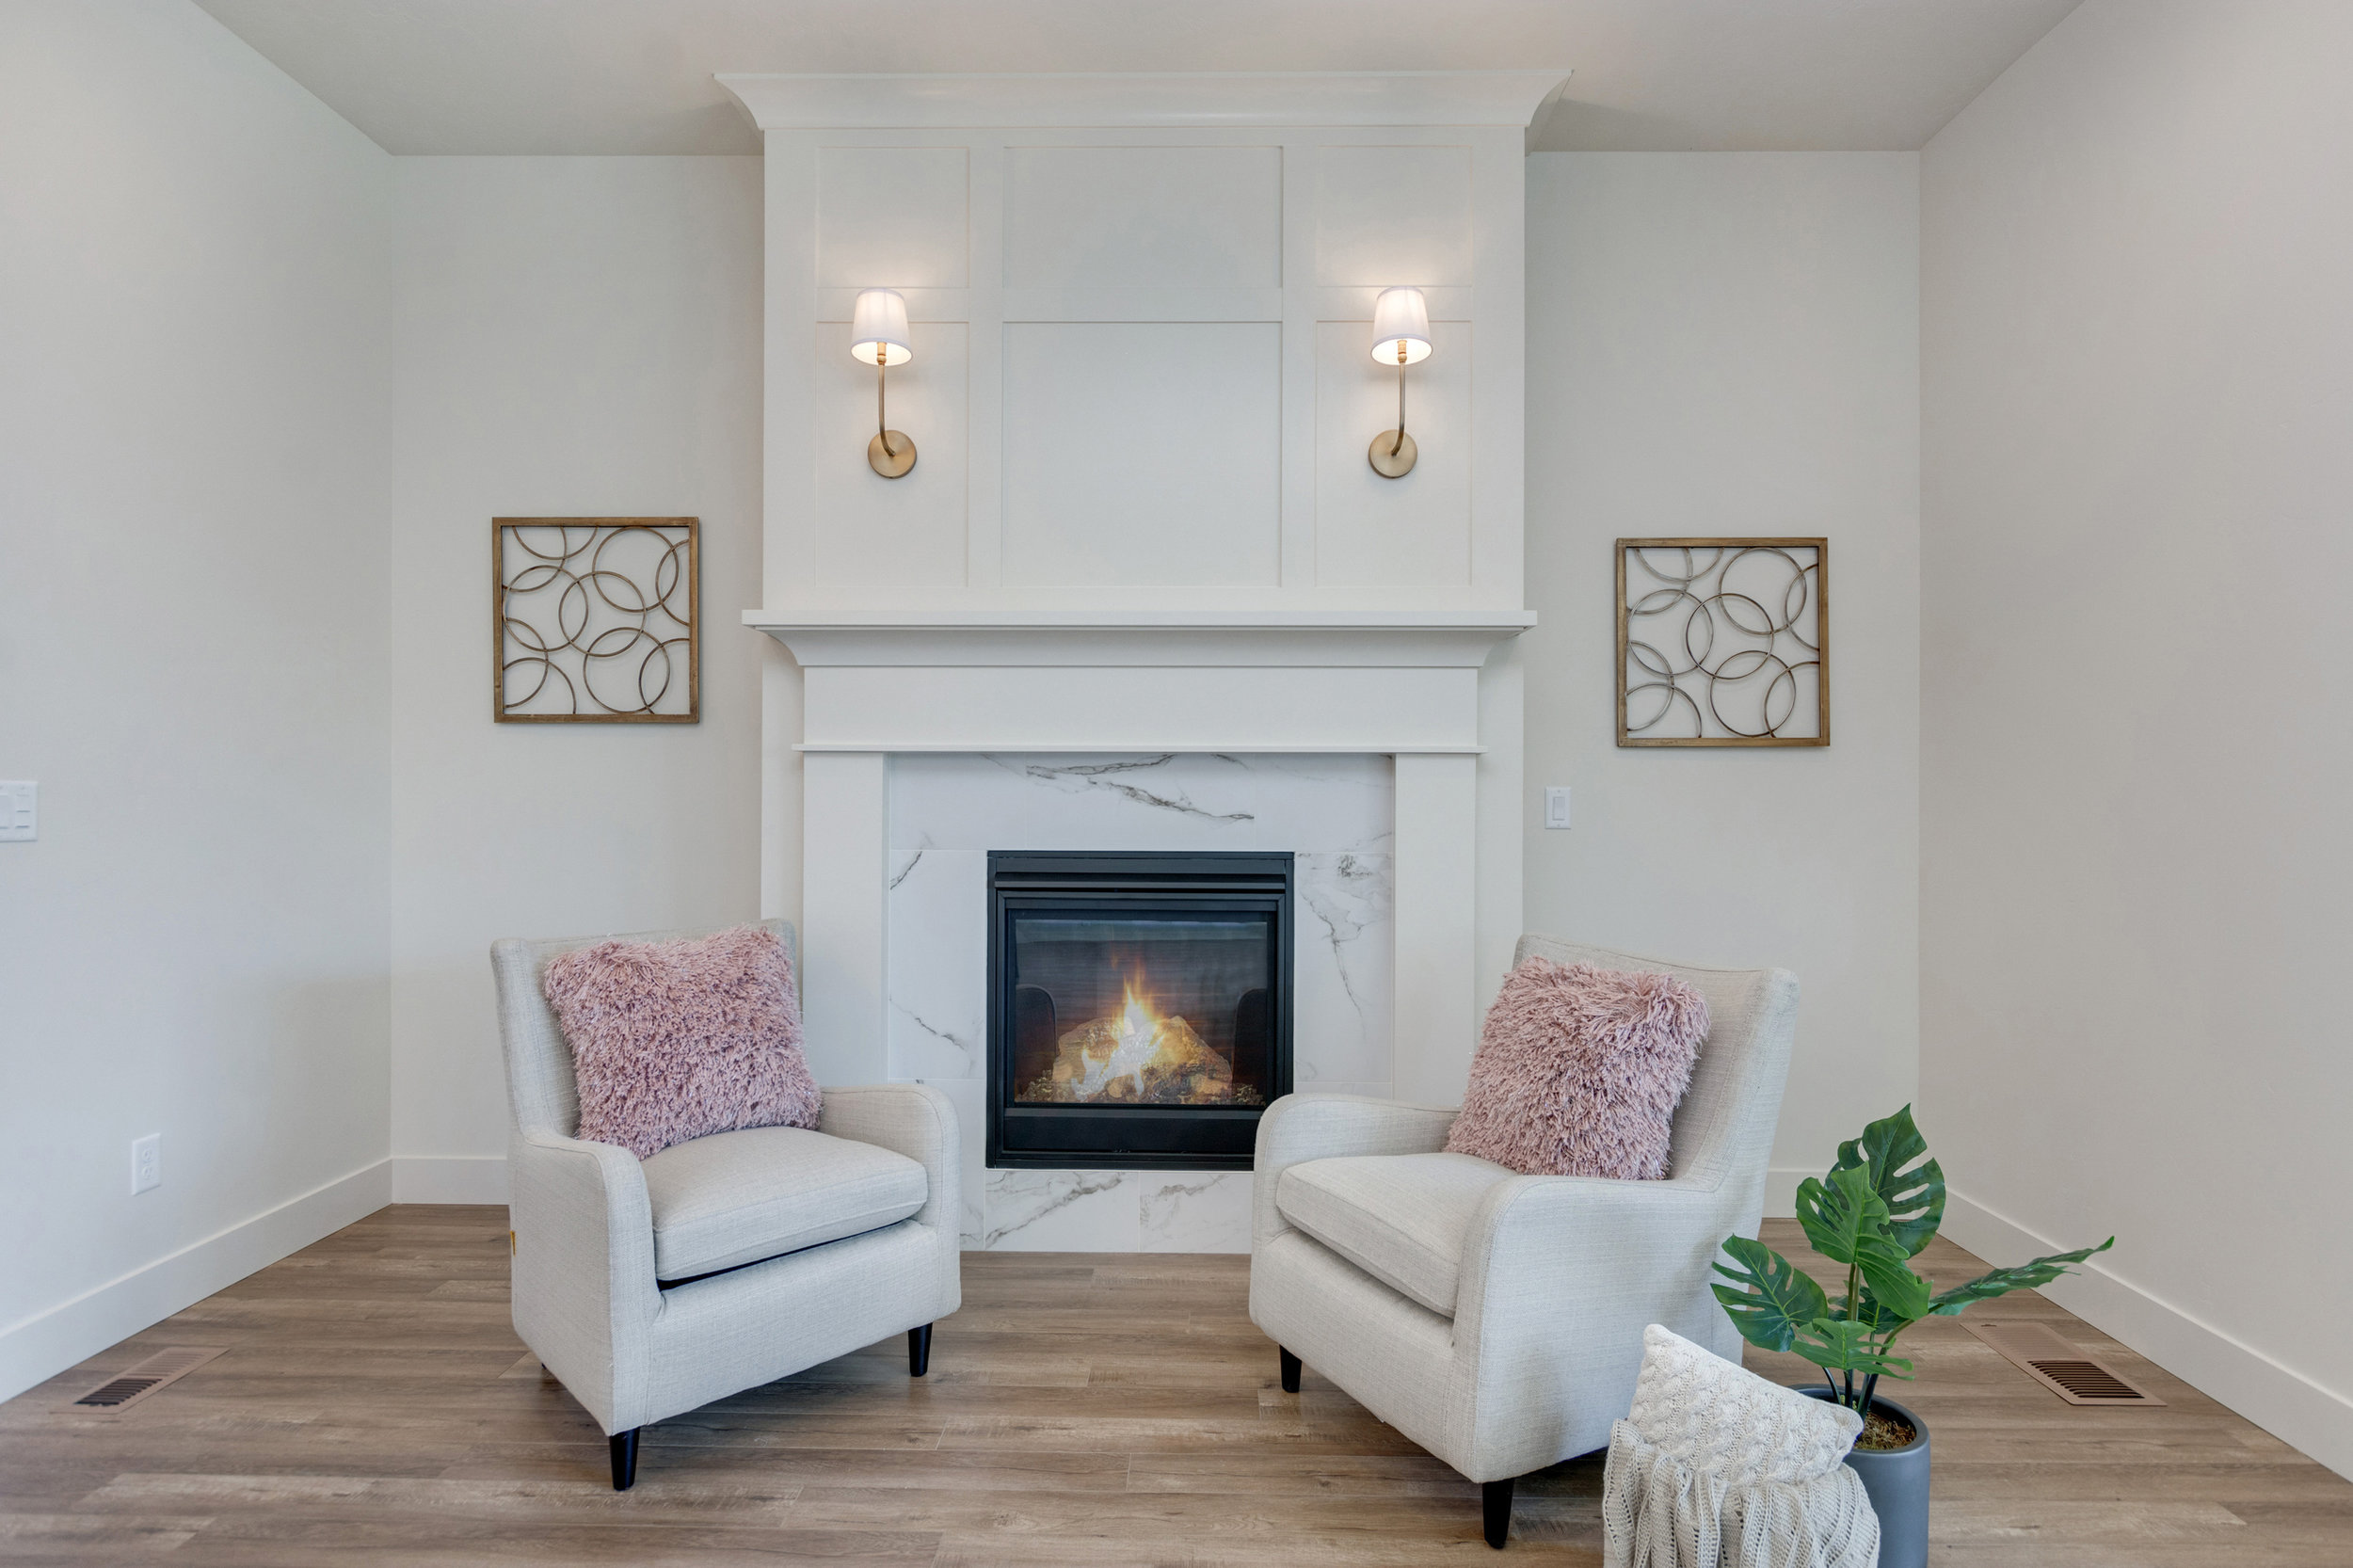 08-Fireplace.jpg